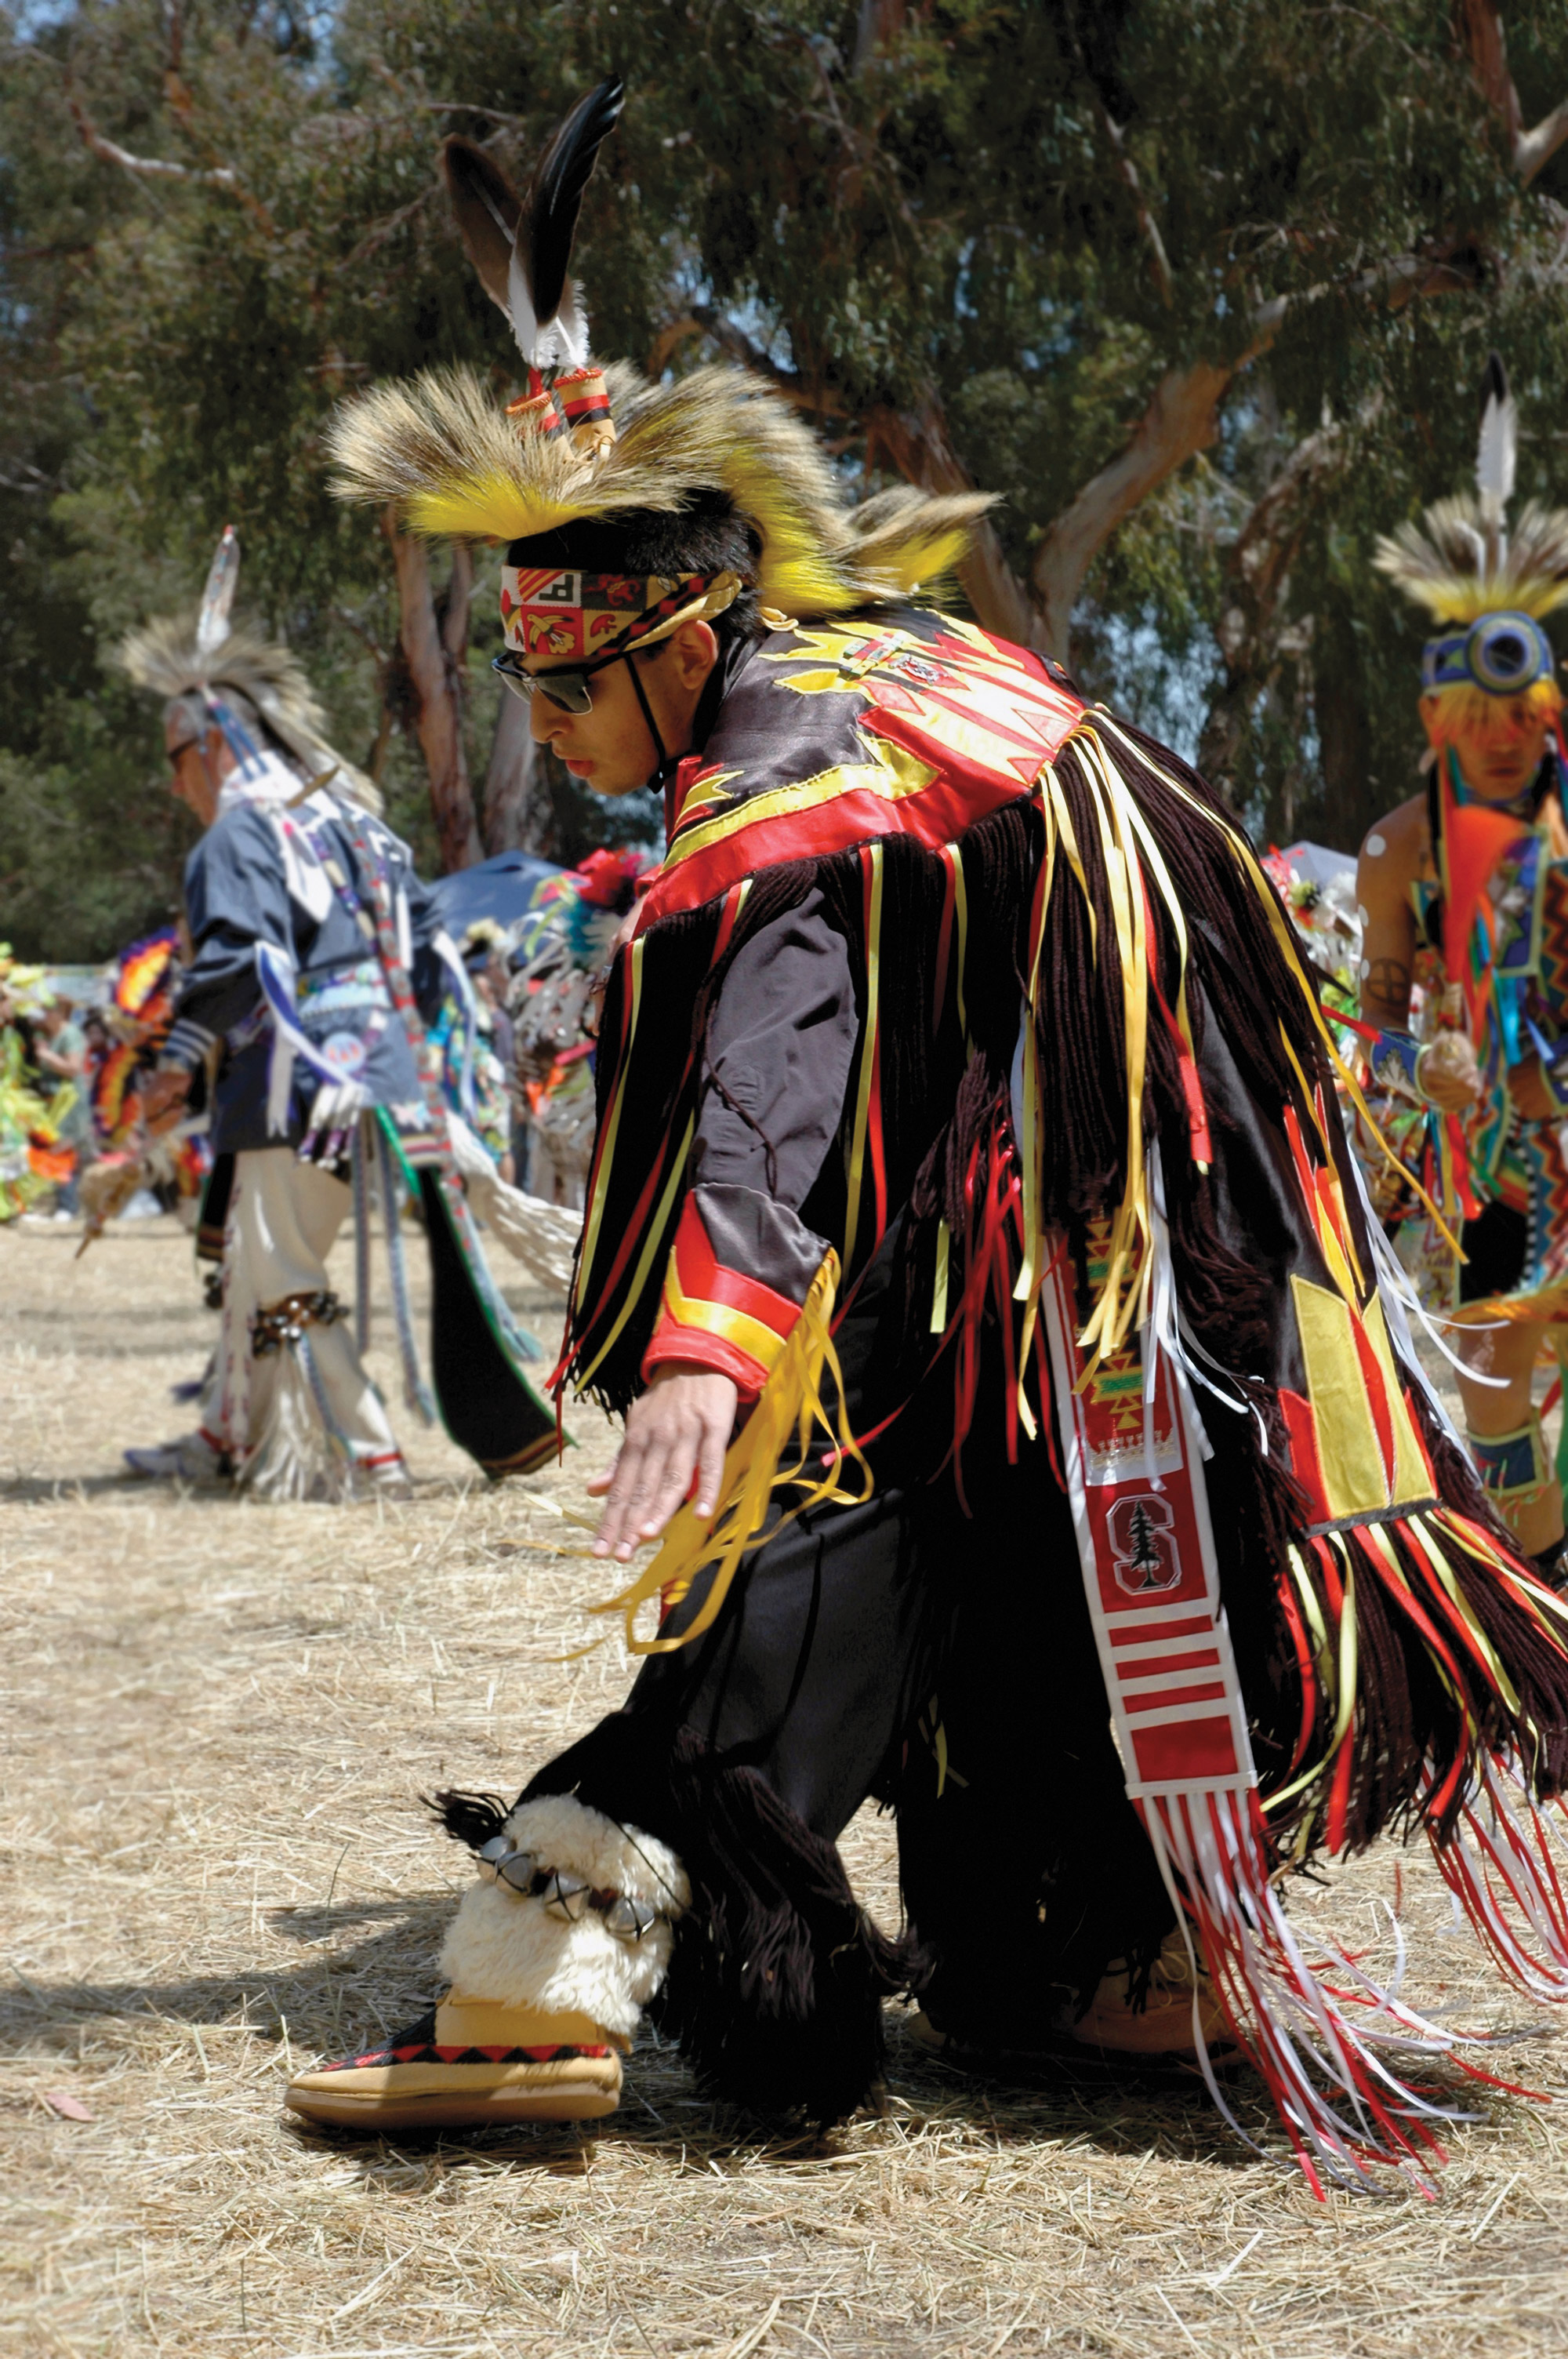 Chandler Hood performing the Grass Dance.